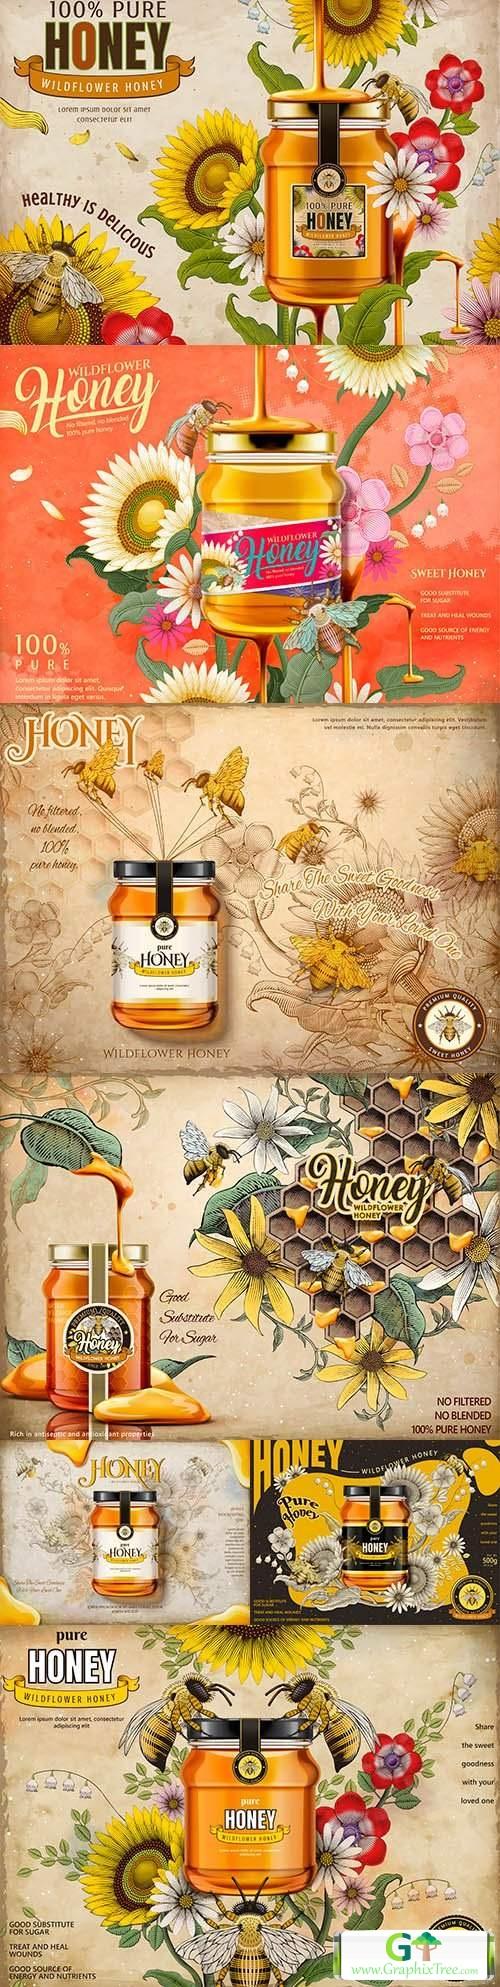 Advertising tasty honey from field flowers in glass jar illustration